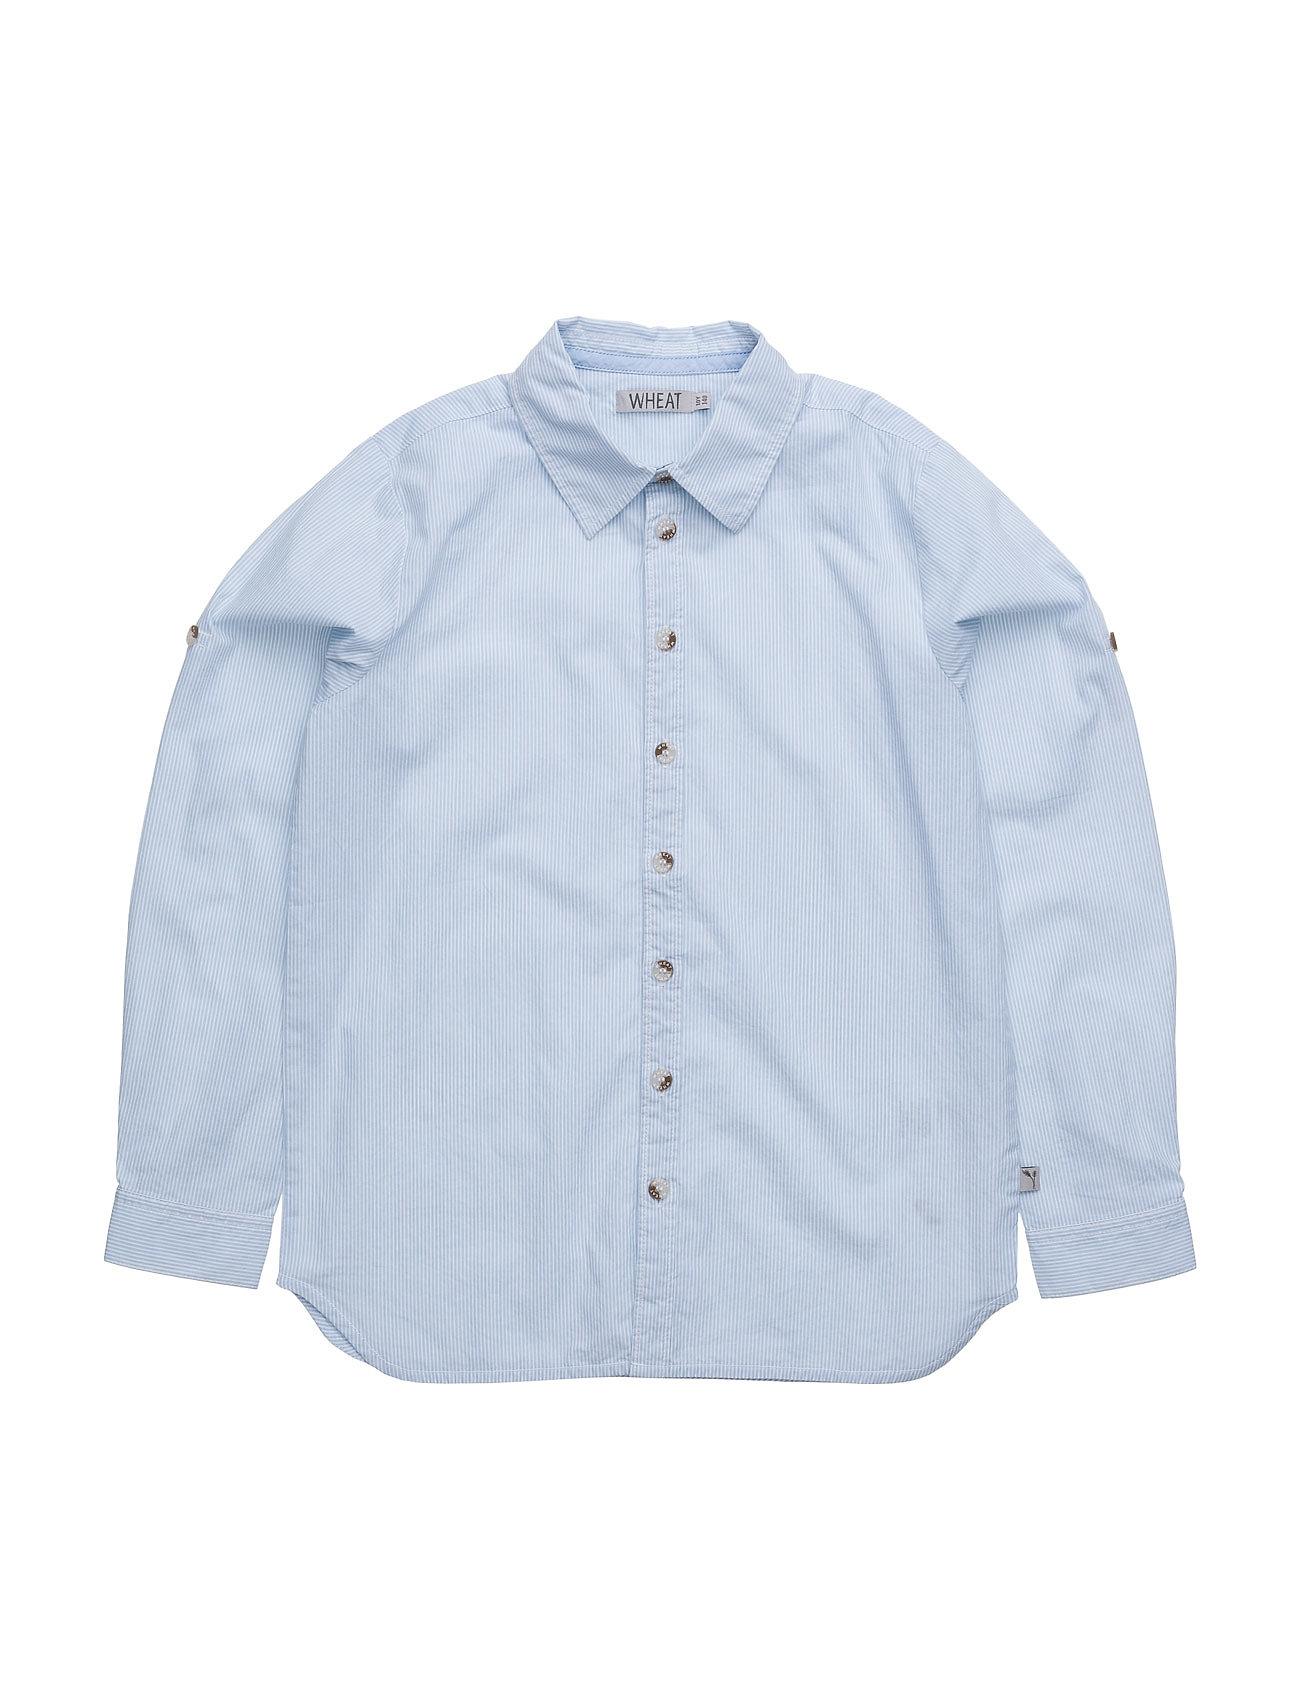 Shirt Pelle Ls Wheat  til Børn i